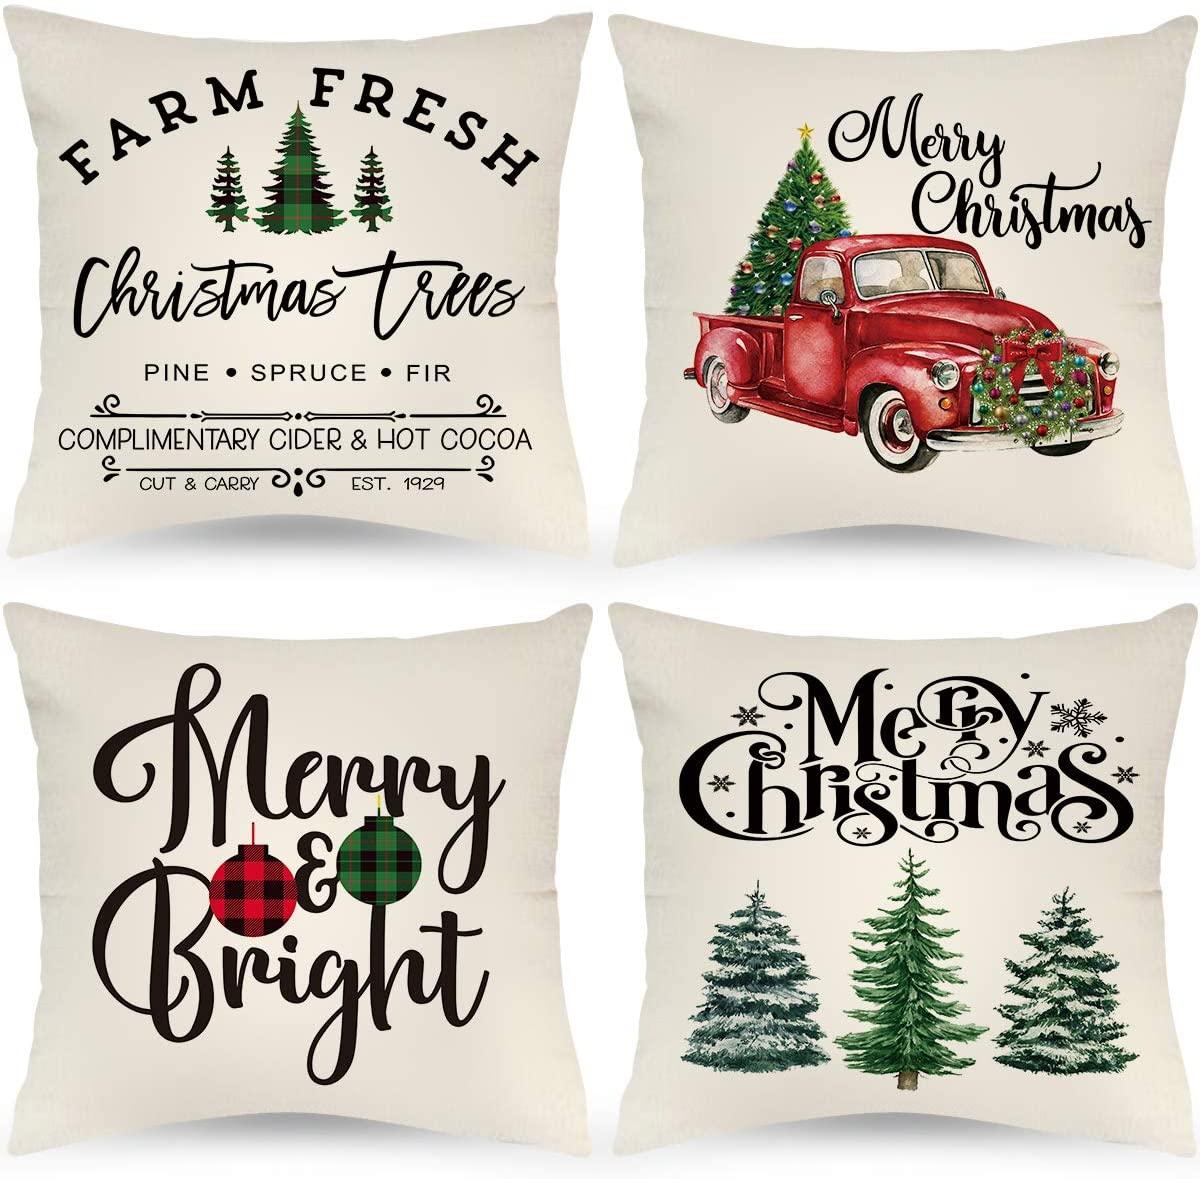 LAVEVE Farmhouse Christmas Pillow Covers, 22x22 Set of 4 Christmas Decor Throw Pillows Buffalo Plaid Christmas Decorations Red Truck Buffalo Check Throw Pillow Covers